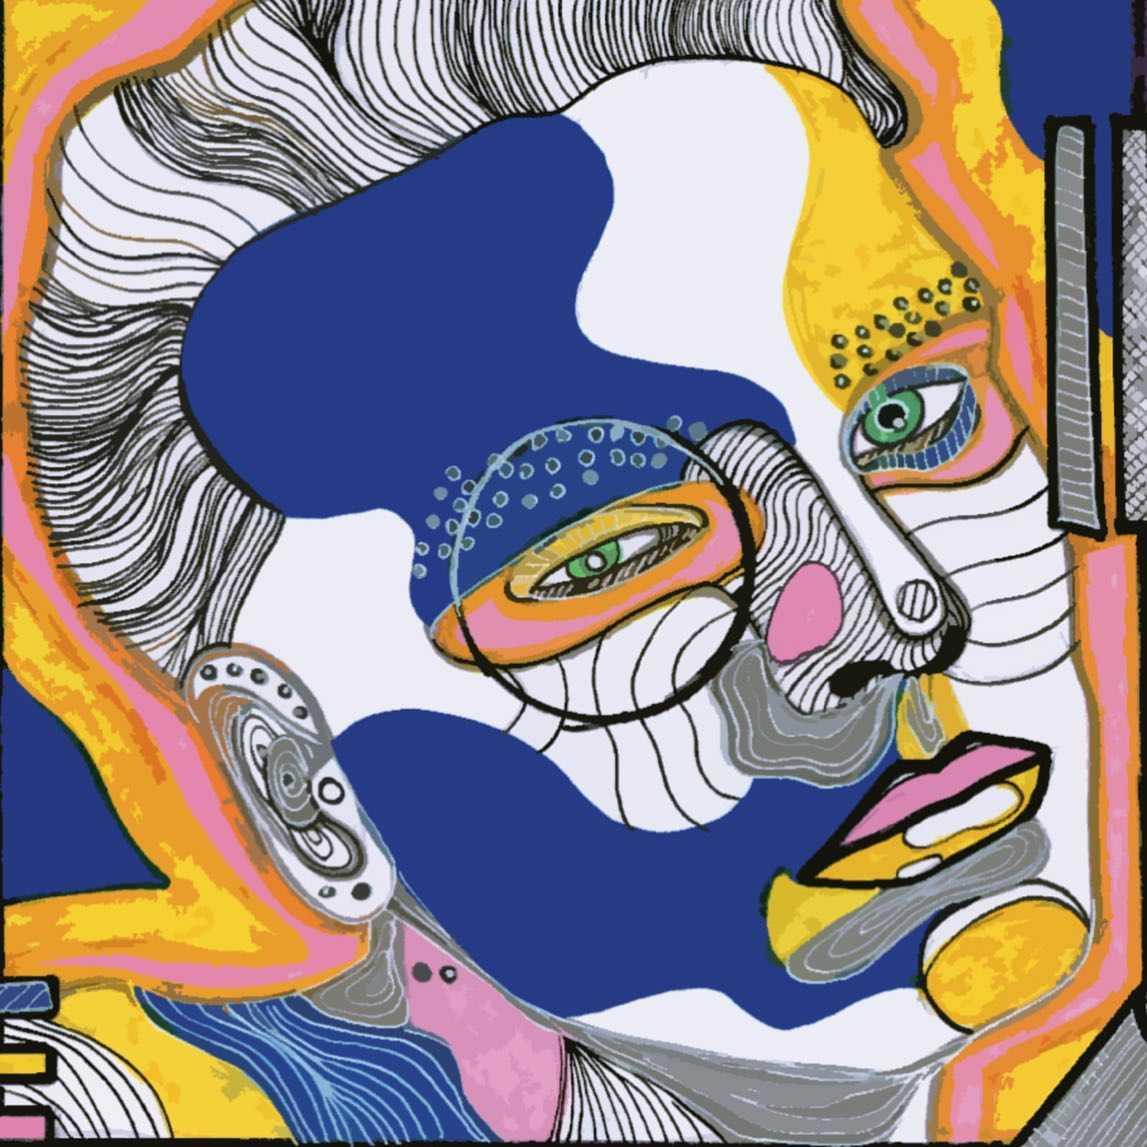 Aquarius 🐋  .  #illustration#digitalillustration#drawing#colourfulillustration#face#womenofillustration#artwork#graphicdesign#shapes#surrealillustration#psychodelicart#art#artsanity#gustedesign#itsnicethat#detaileddrawing#selectedwork#design